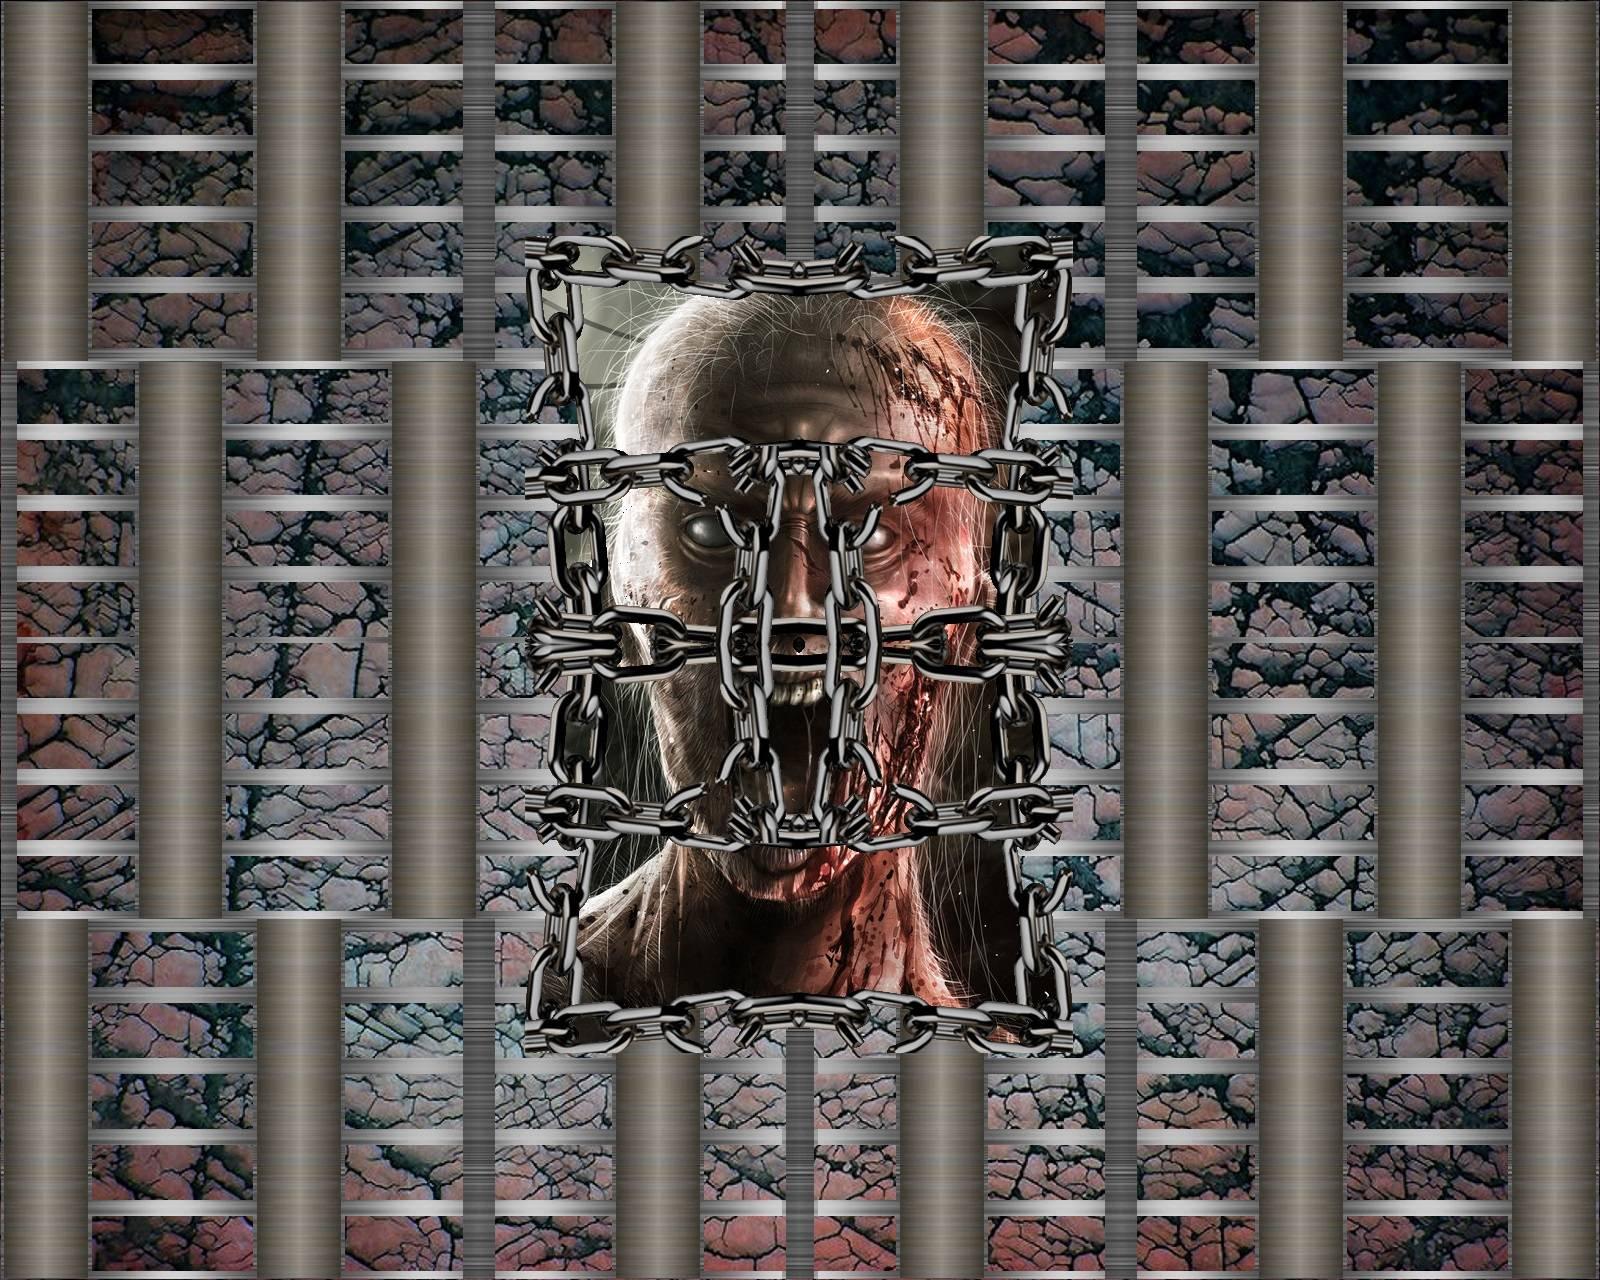 Dead Prison